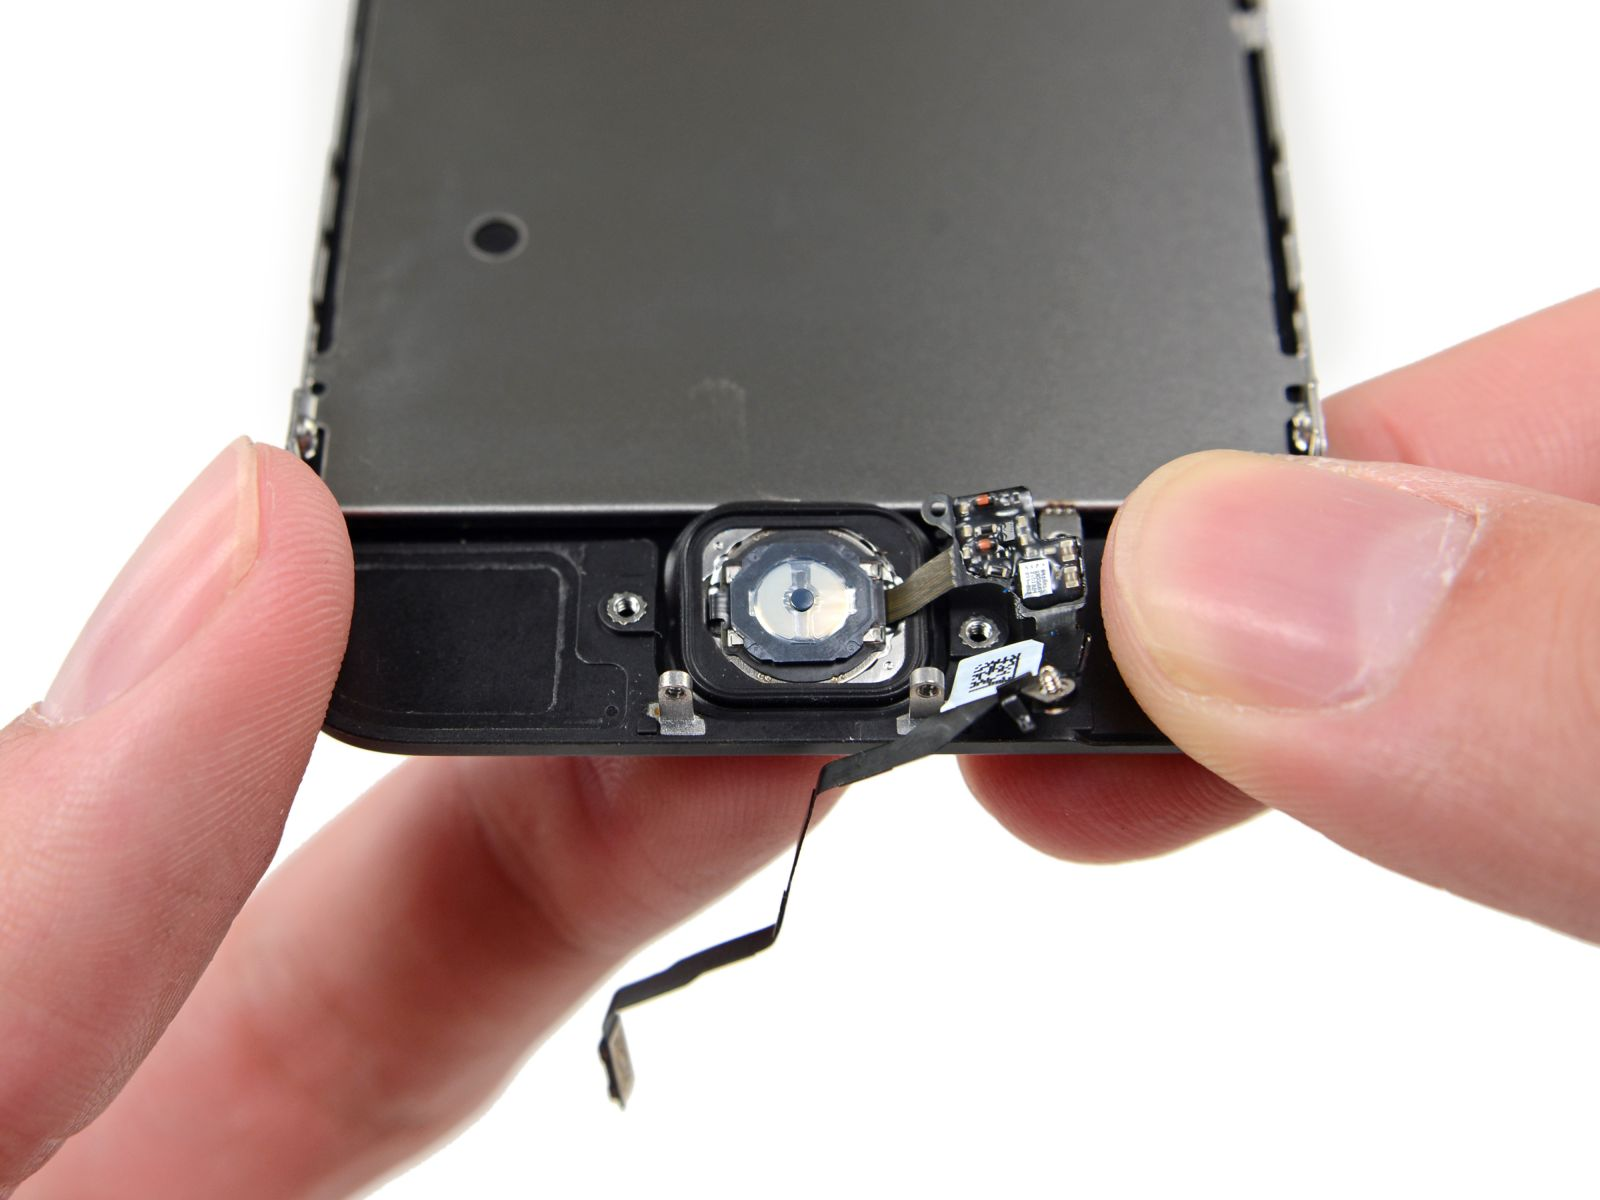 Замена сенсорного стекла и дисплея на iPhone 5S (35)